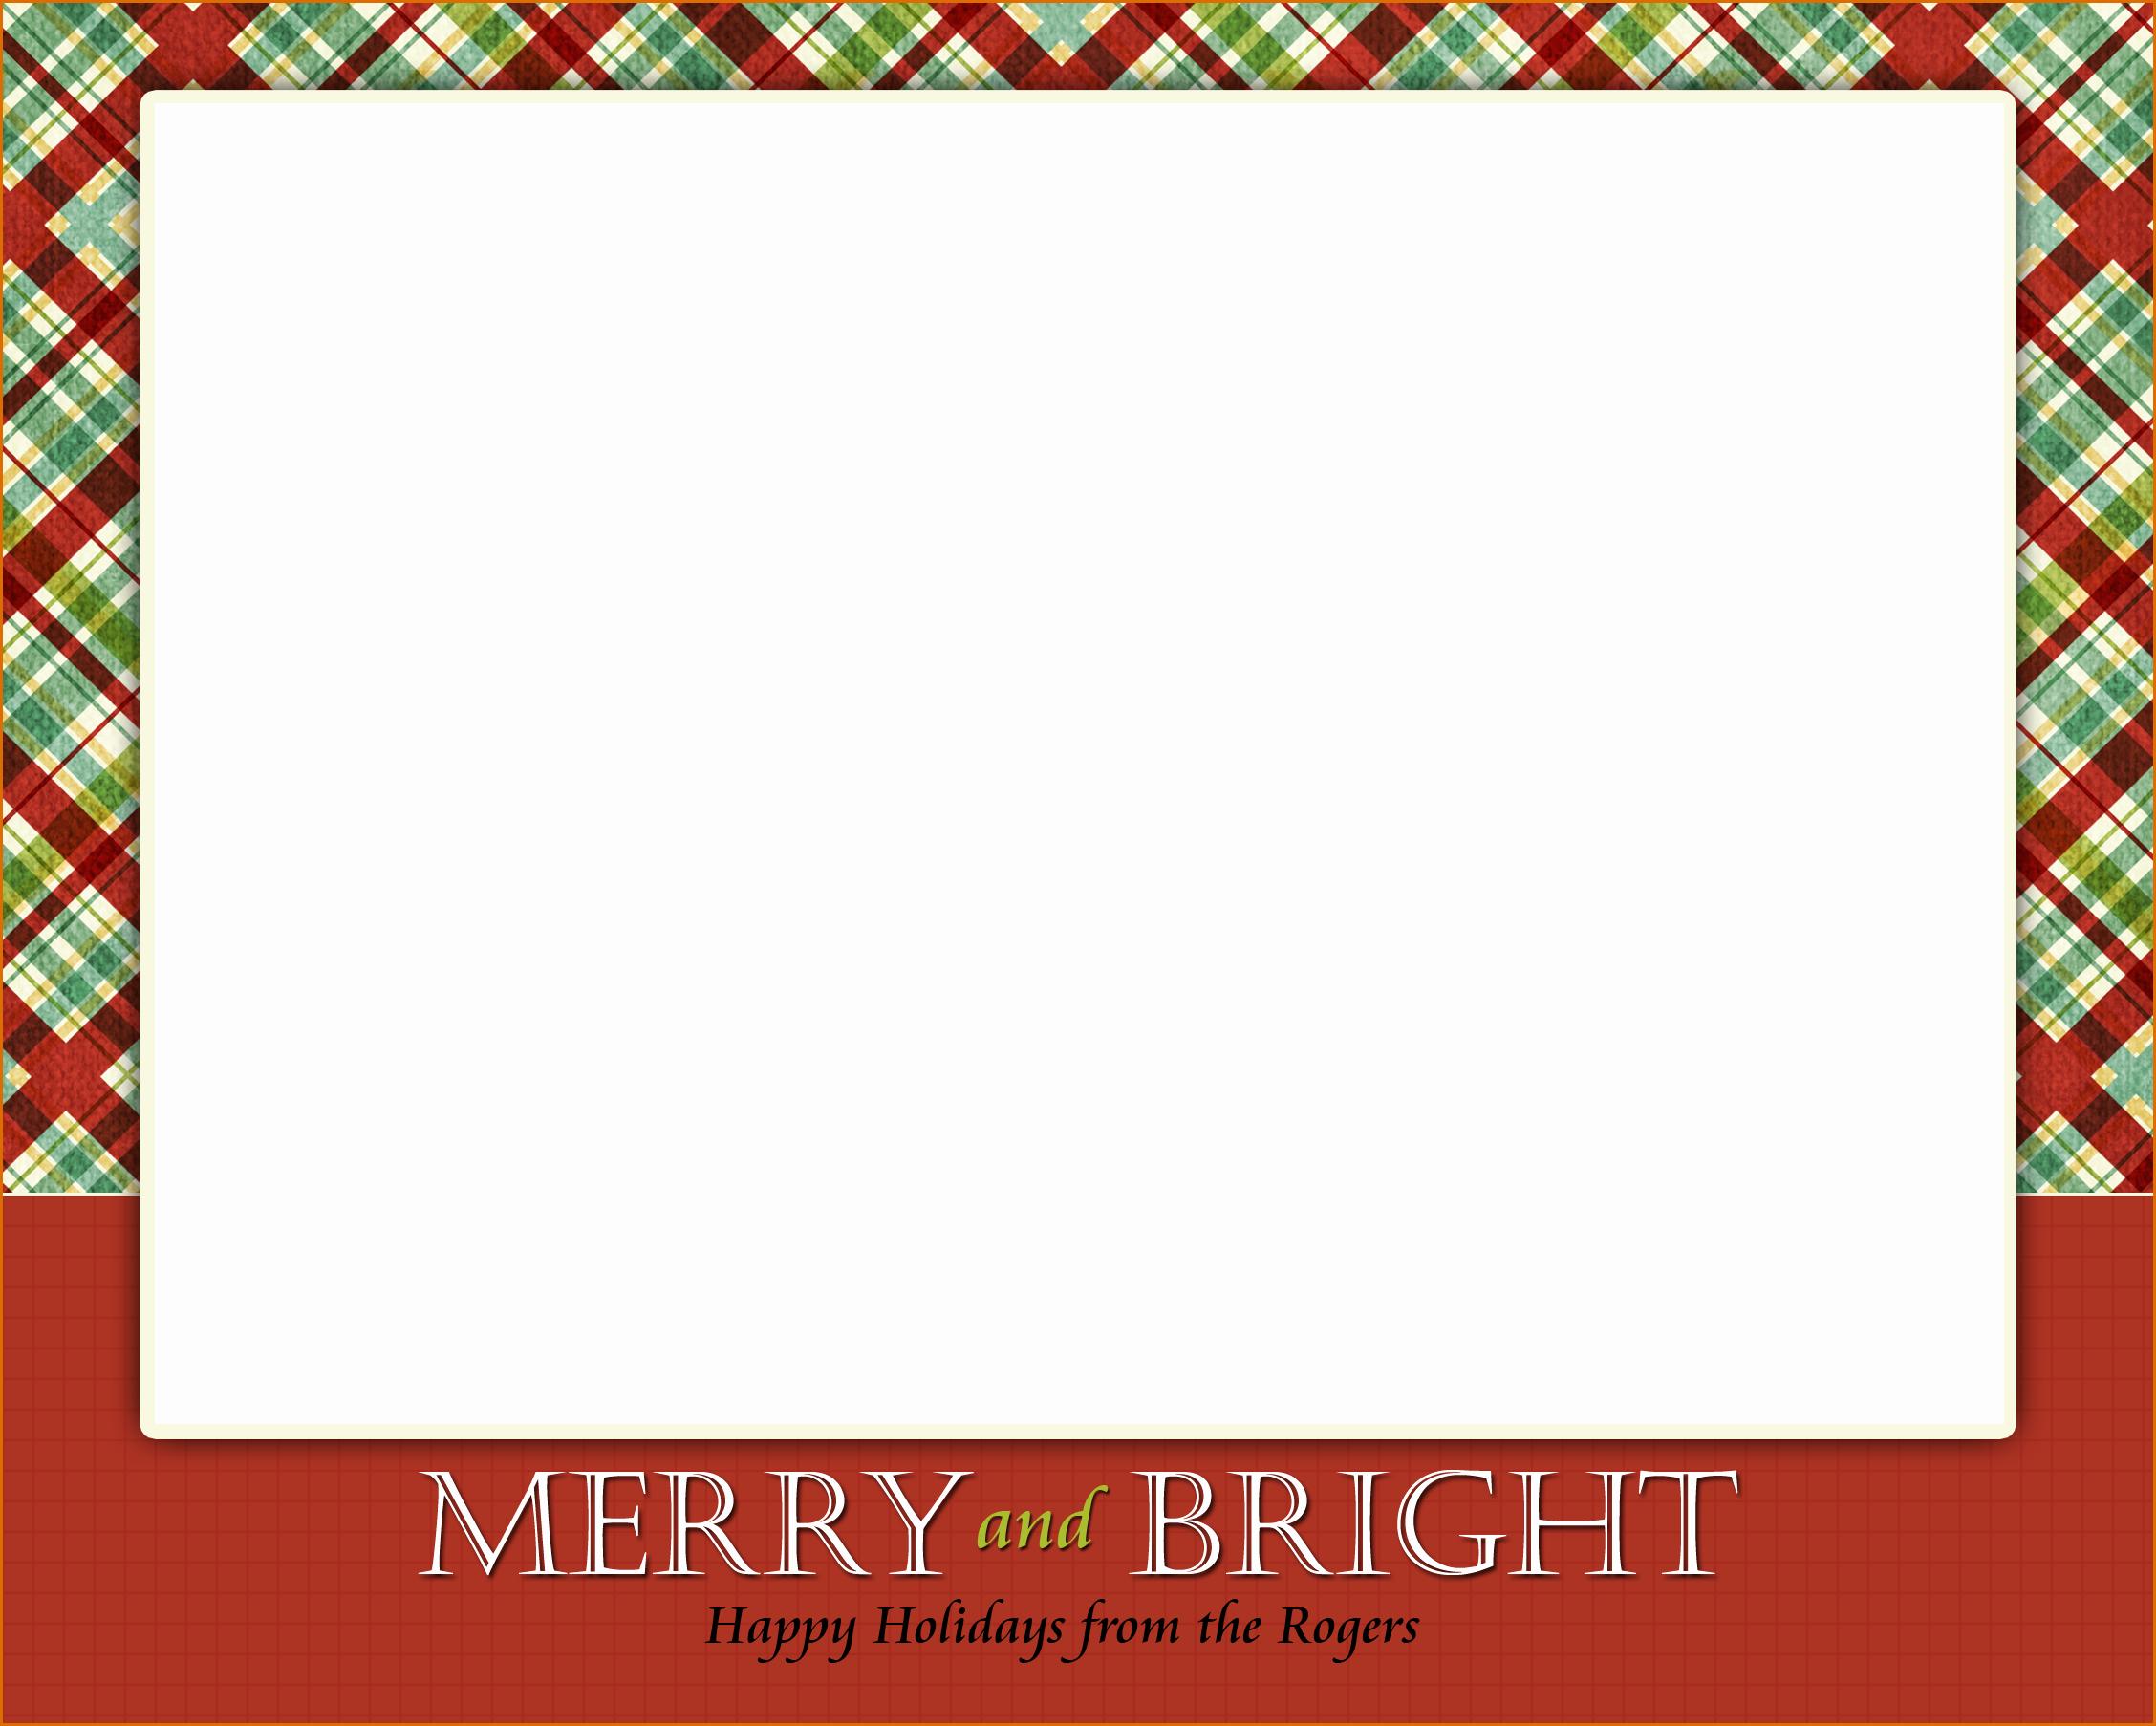 Free Microsoft Word Christmas Template Fresh 12 Free Christmas Templates for Word